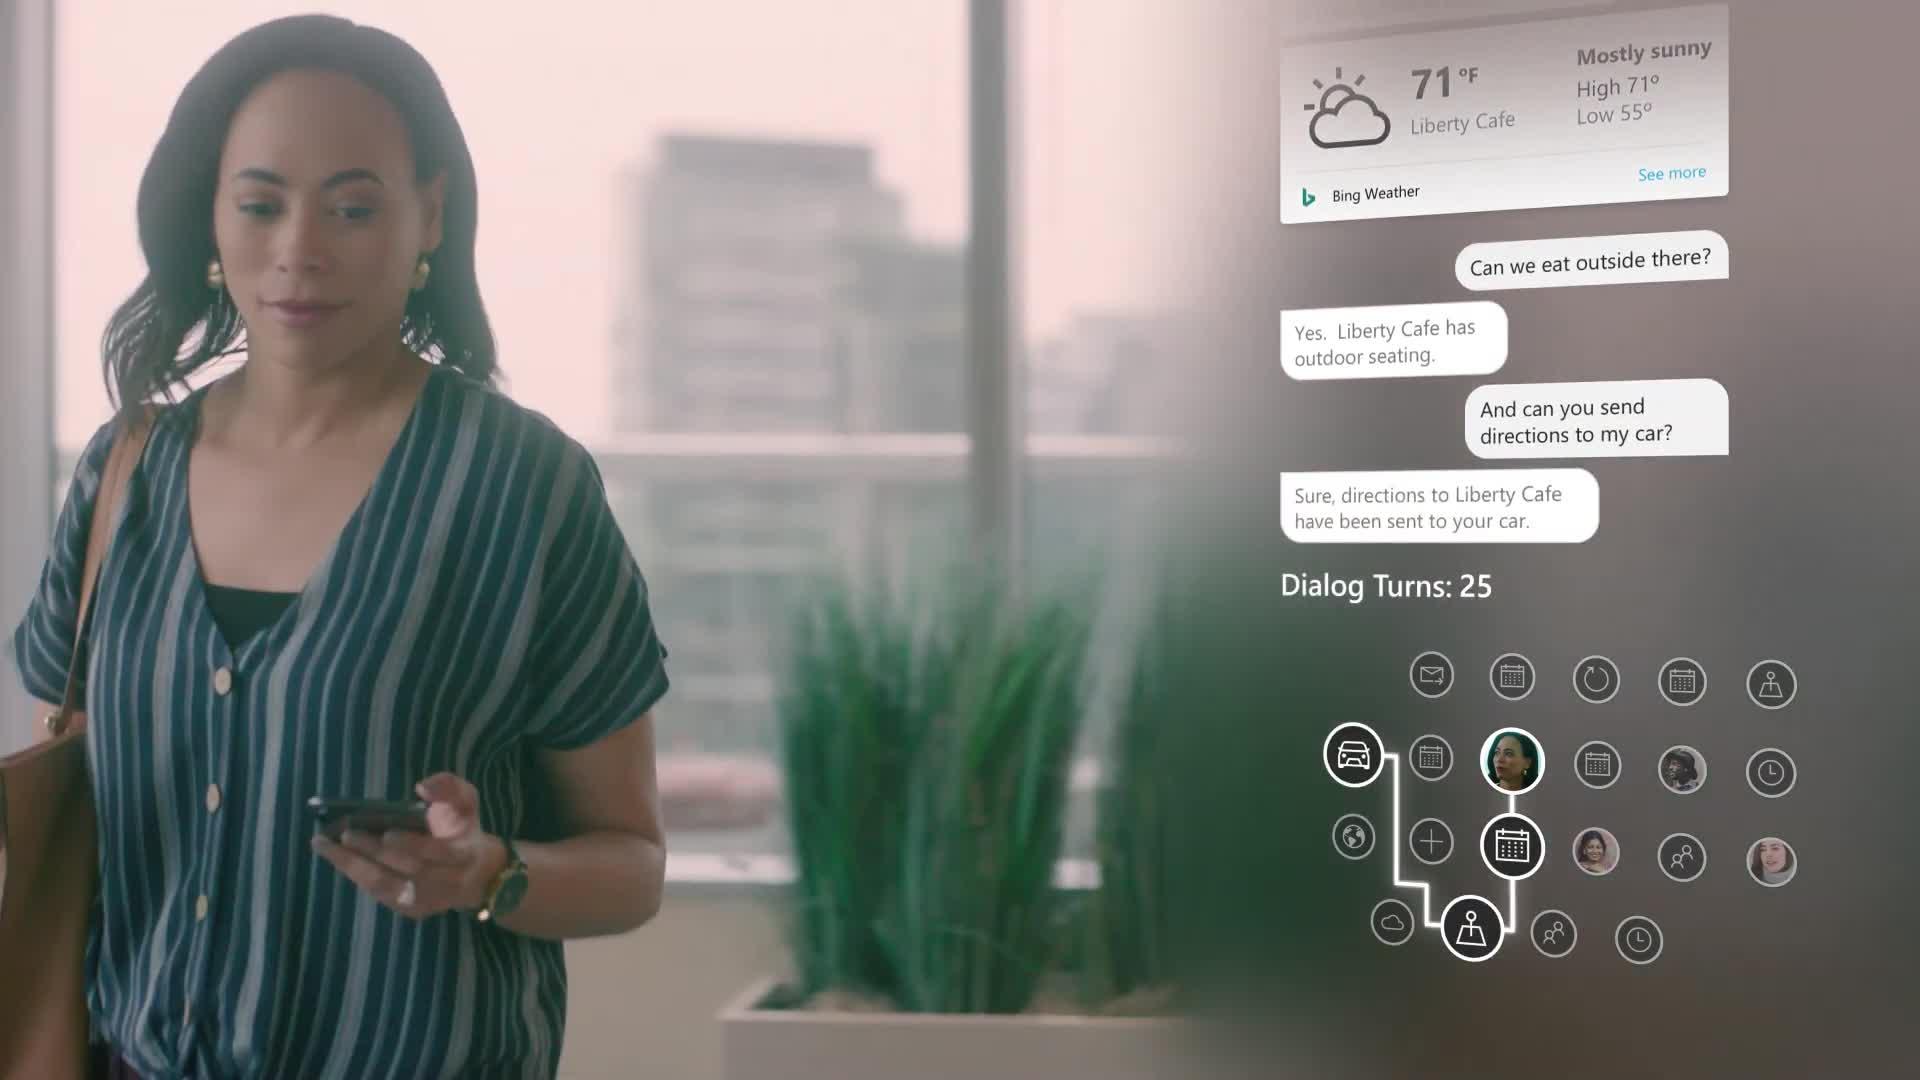 Microsoft, Build, Sprachassistent, Künstliche Intelligenz, Ki, Cortana, AI, Build 2019, Semantic Machines